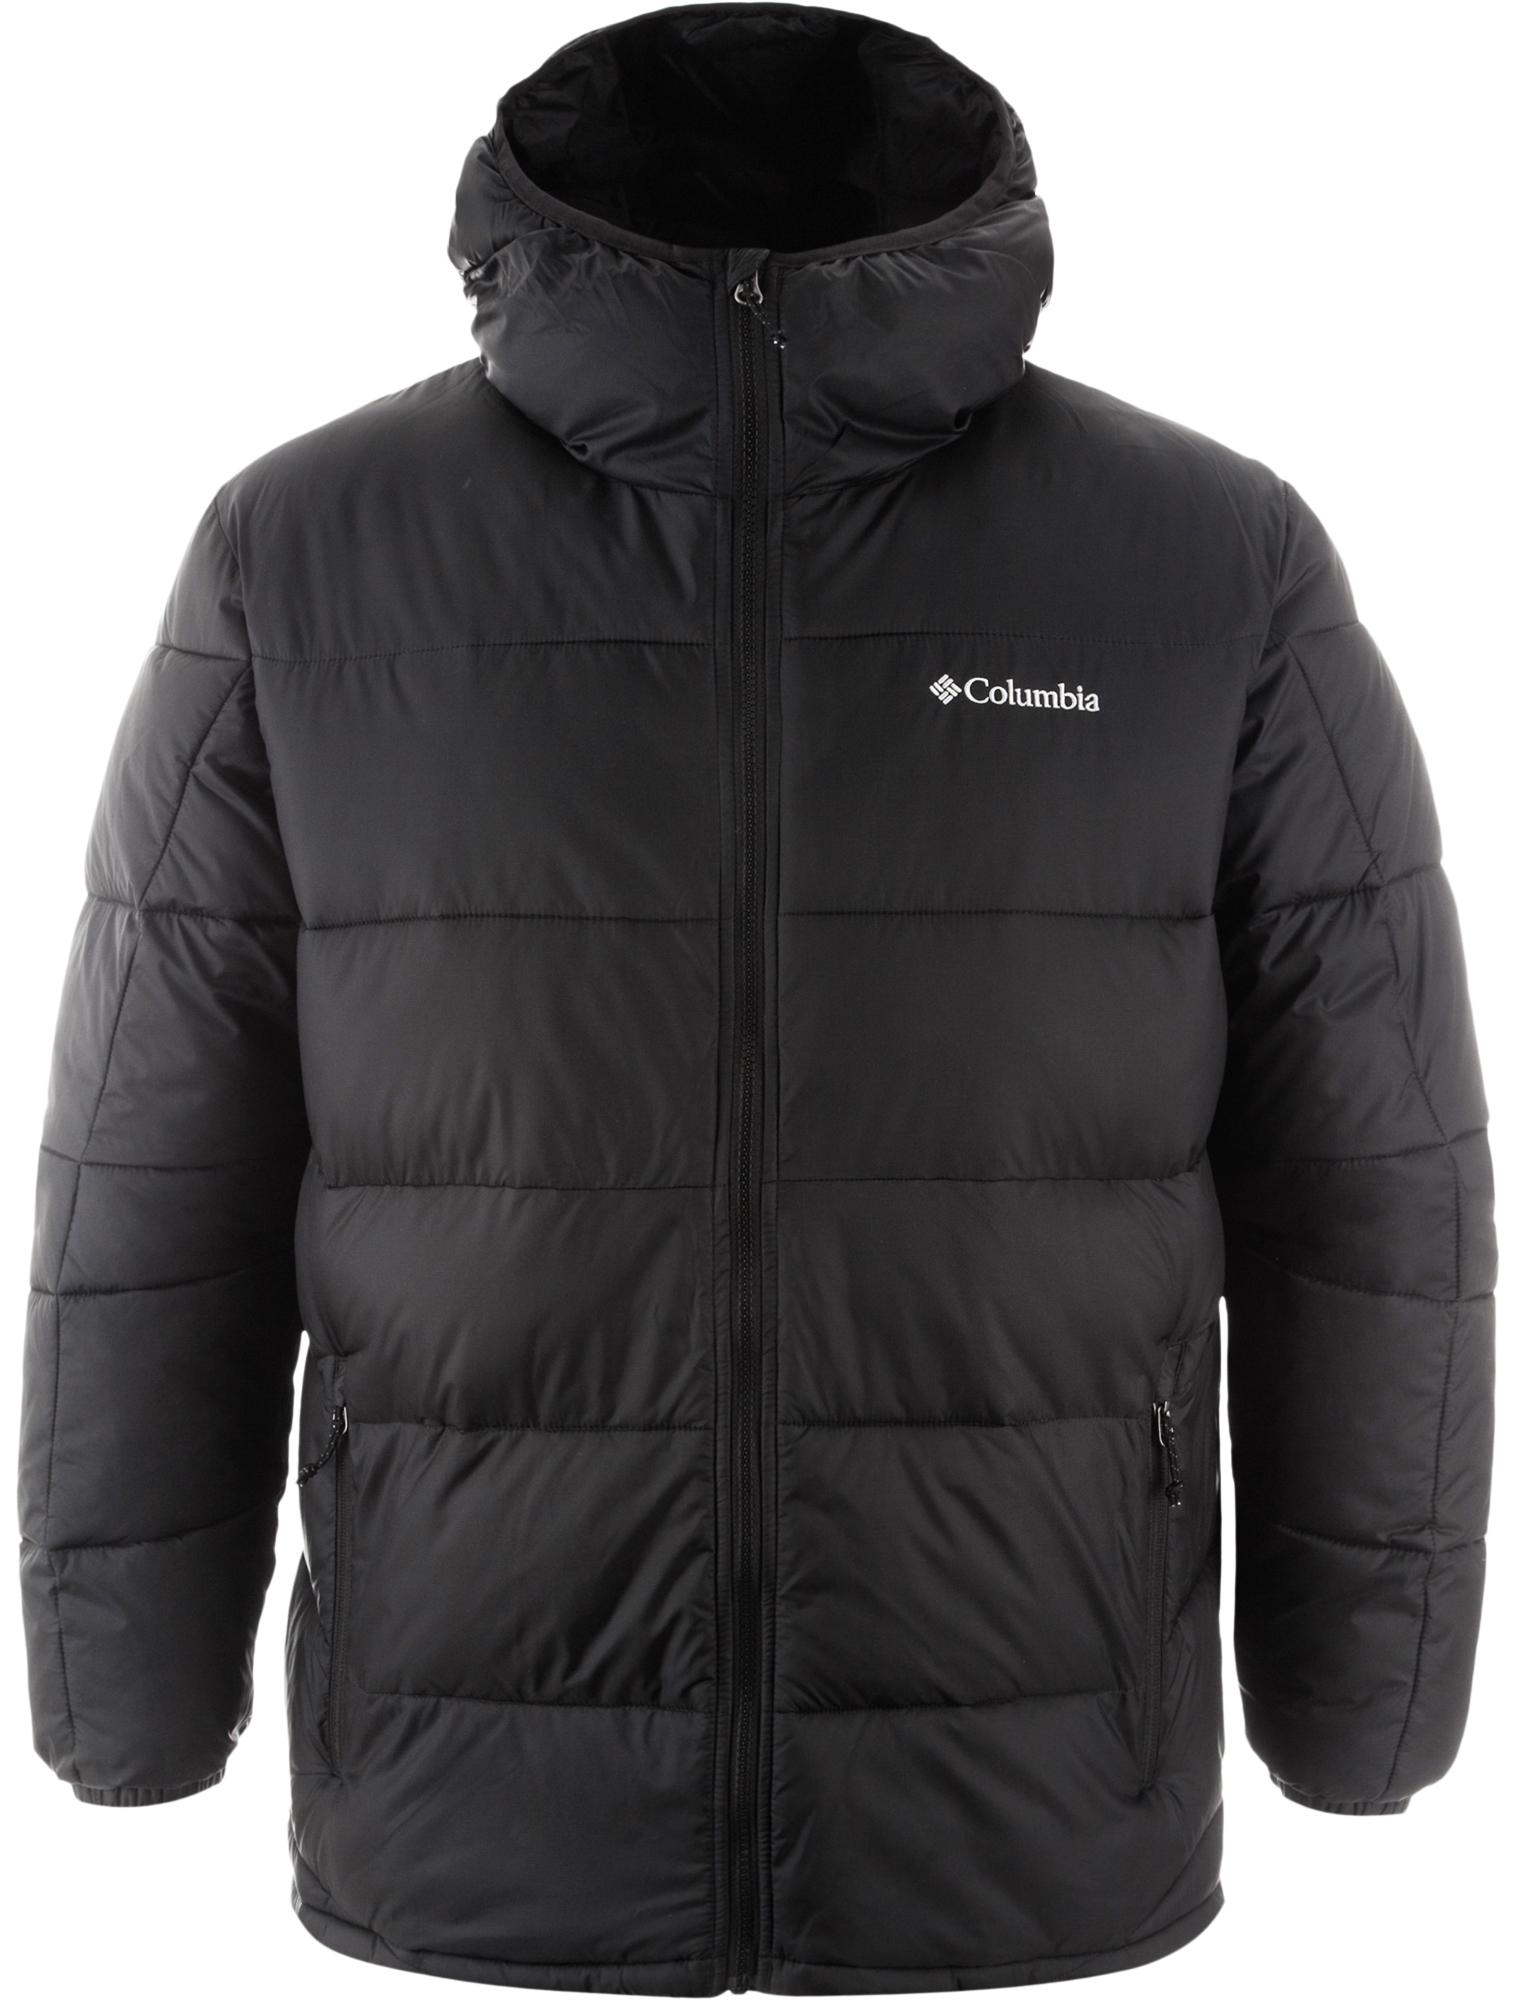 Columbia Куртка утепленная мужская Columbia Munson Point, размер 48-50 columbia куртка 3 в 1 мужская columbia whirlibird размер 48 50